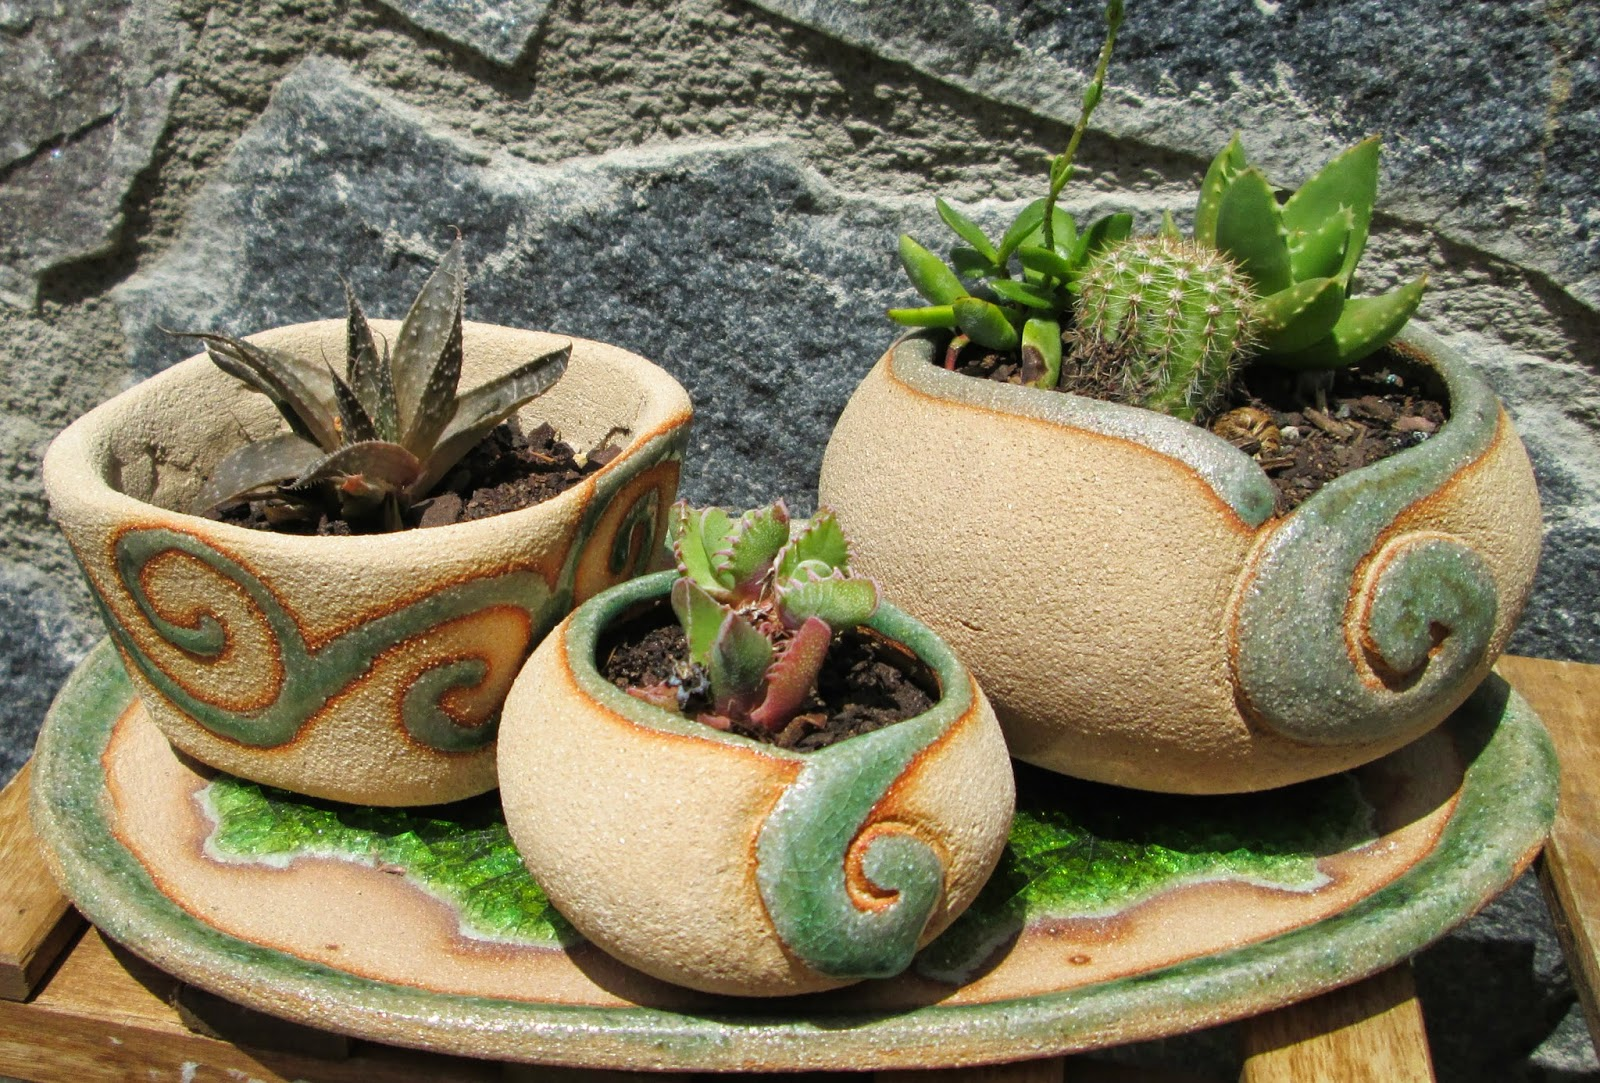 macetas para cactus, macetas para crasas, macetas para suculentas, decoracion jardin, decoración rustica, macetas para el jardin, macetas decoradas, macetas para exterior